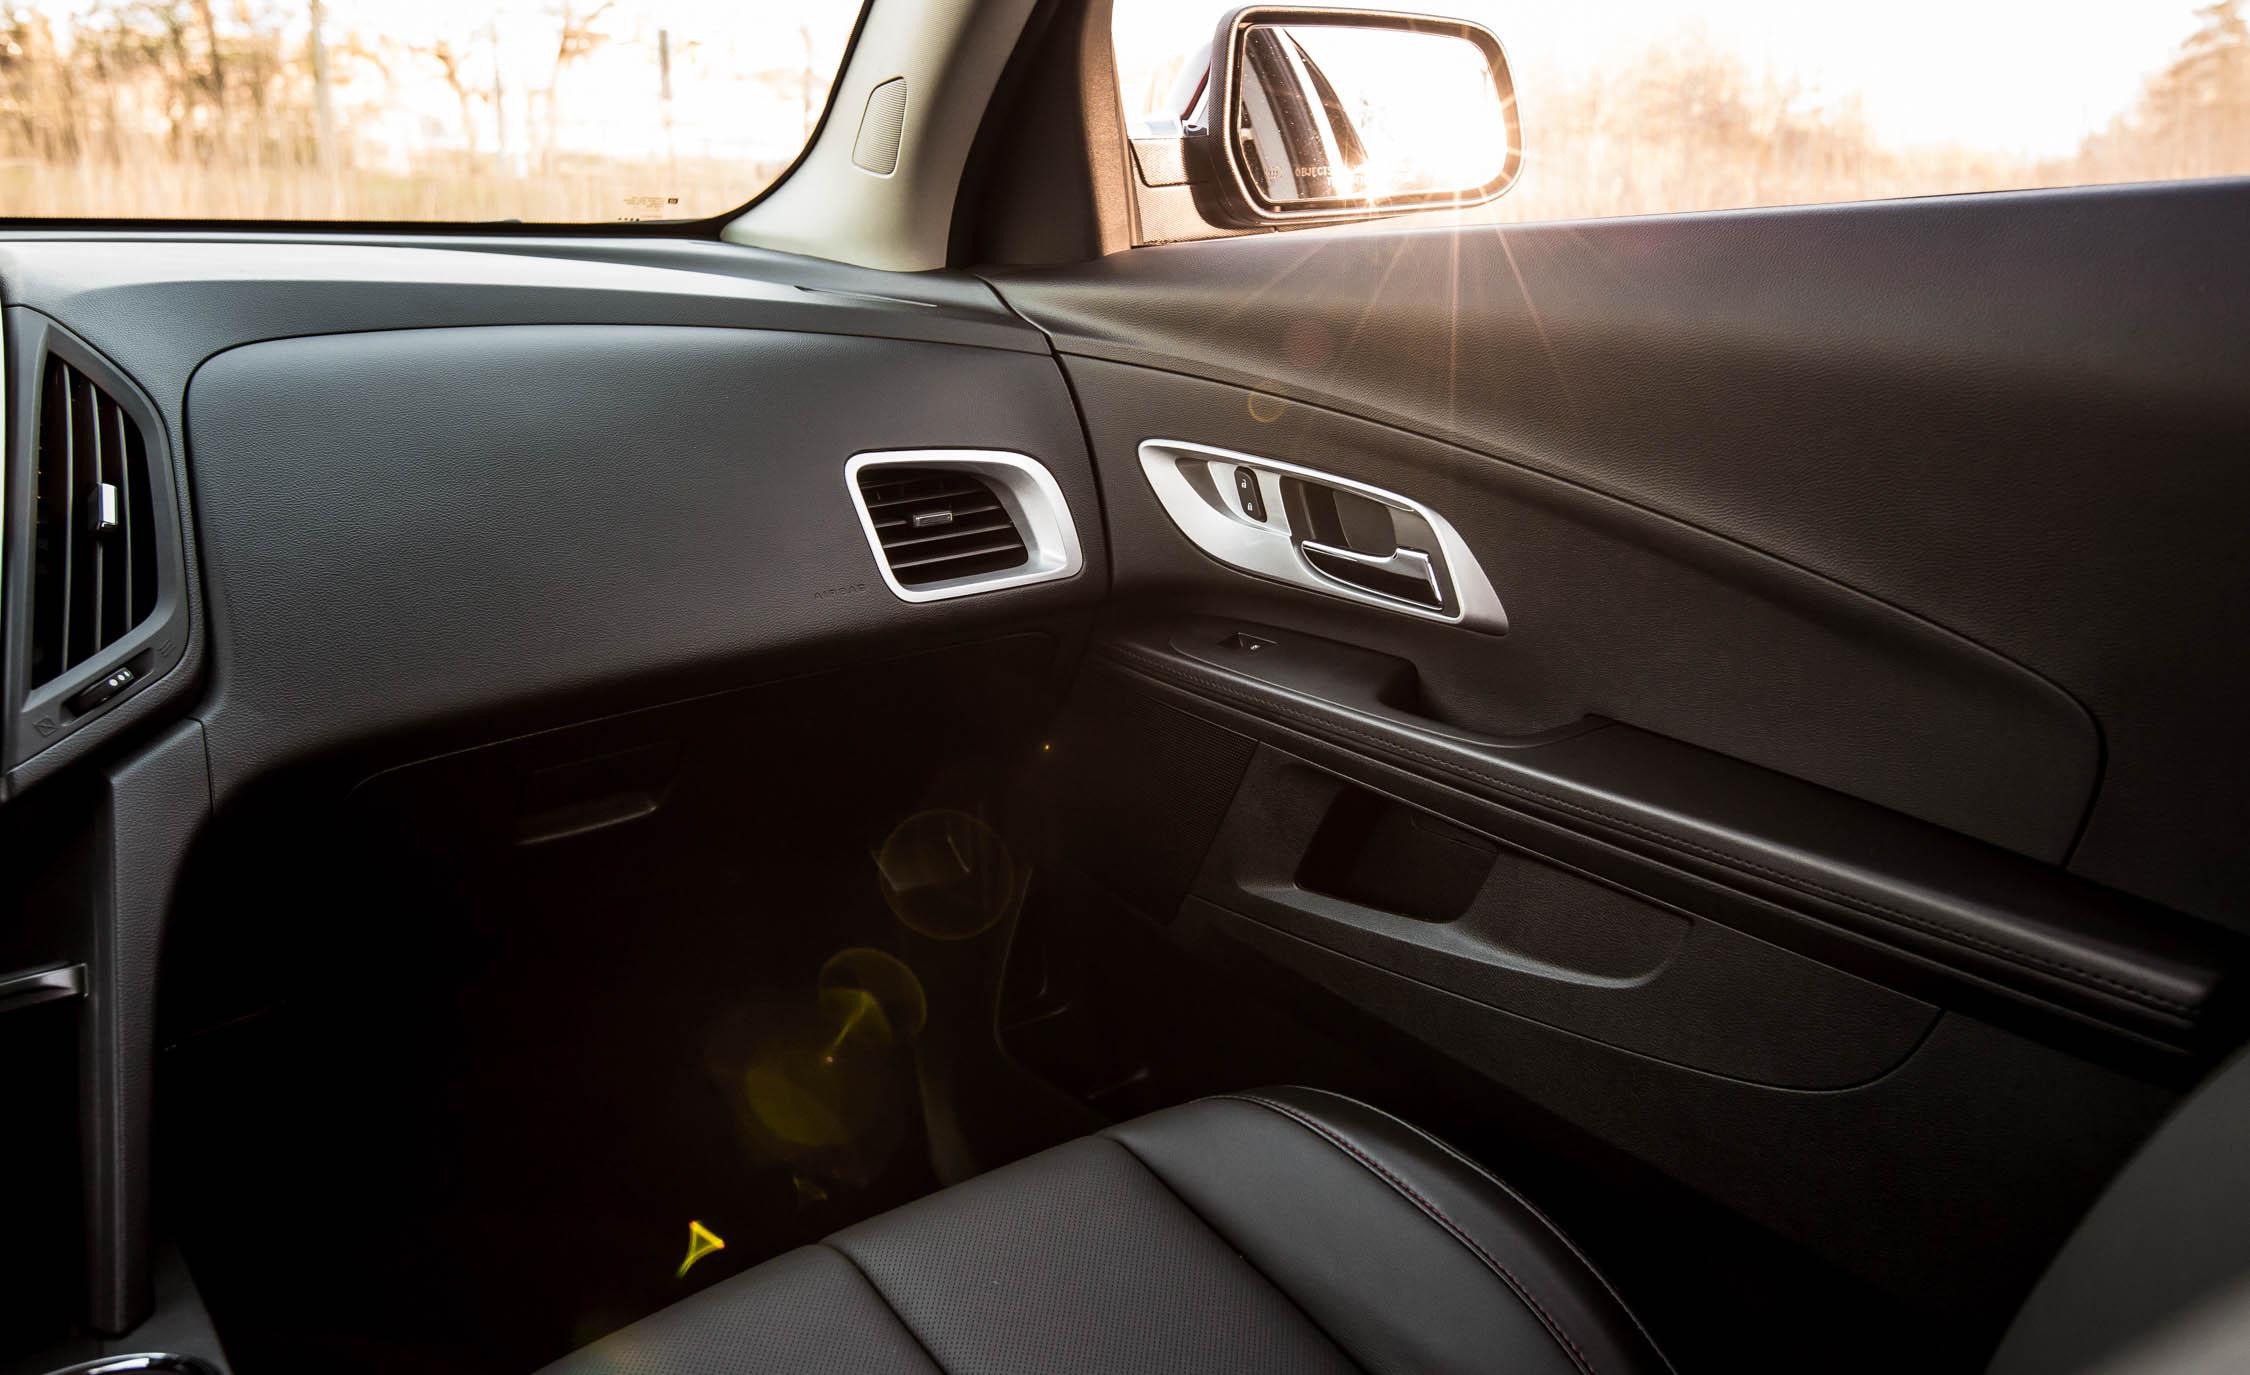 2016 Chevrolet Equinox LTZ (Photo 5 of 25)